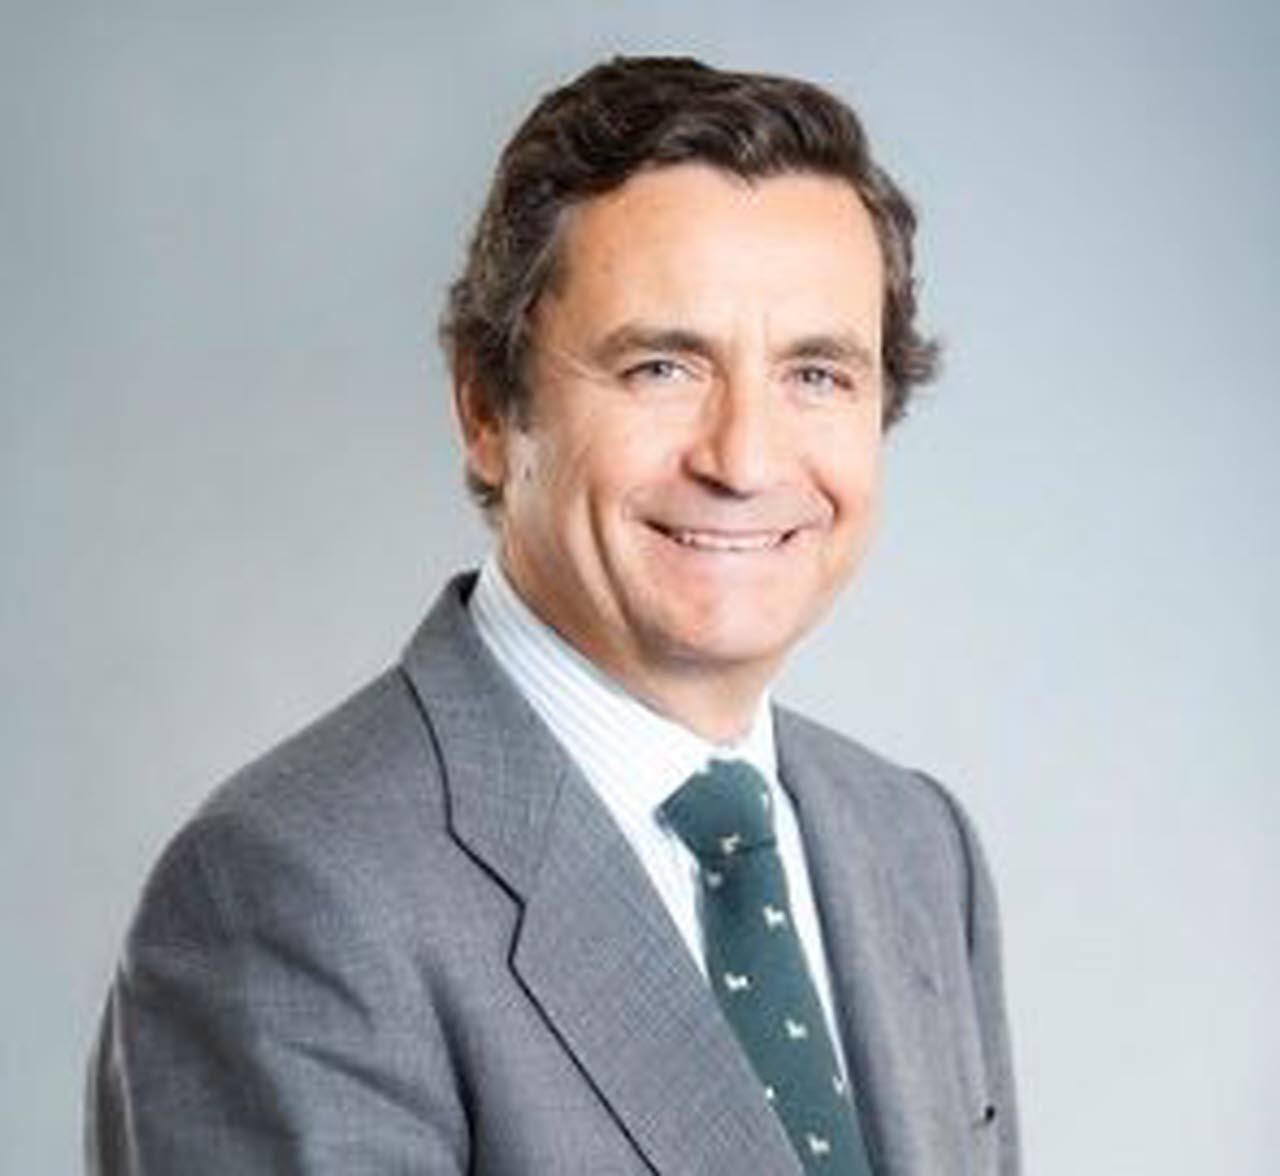 Eduardo Fernández-Cuesta FRICS, presidente de RICS en España